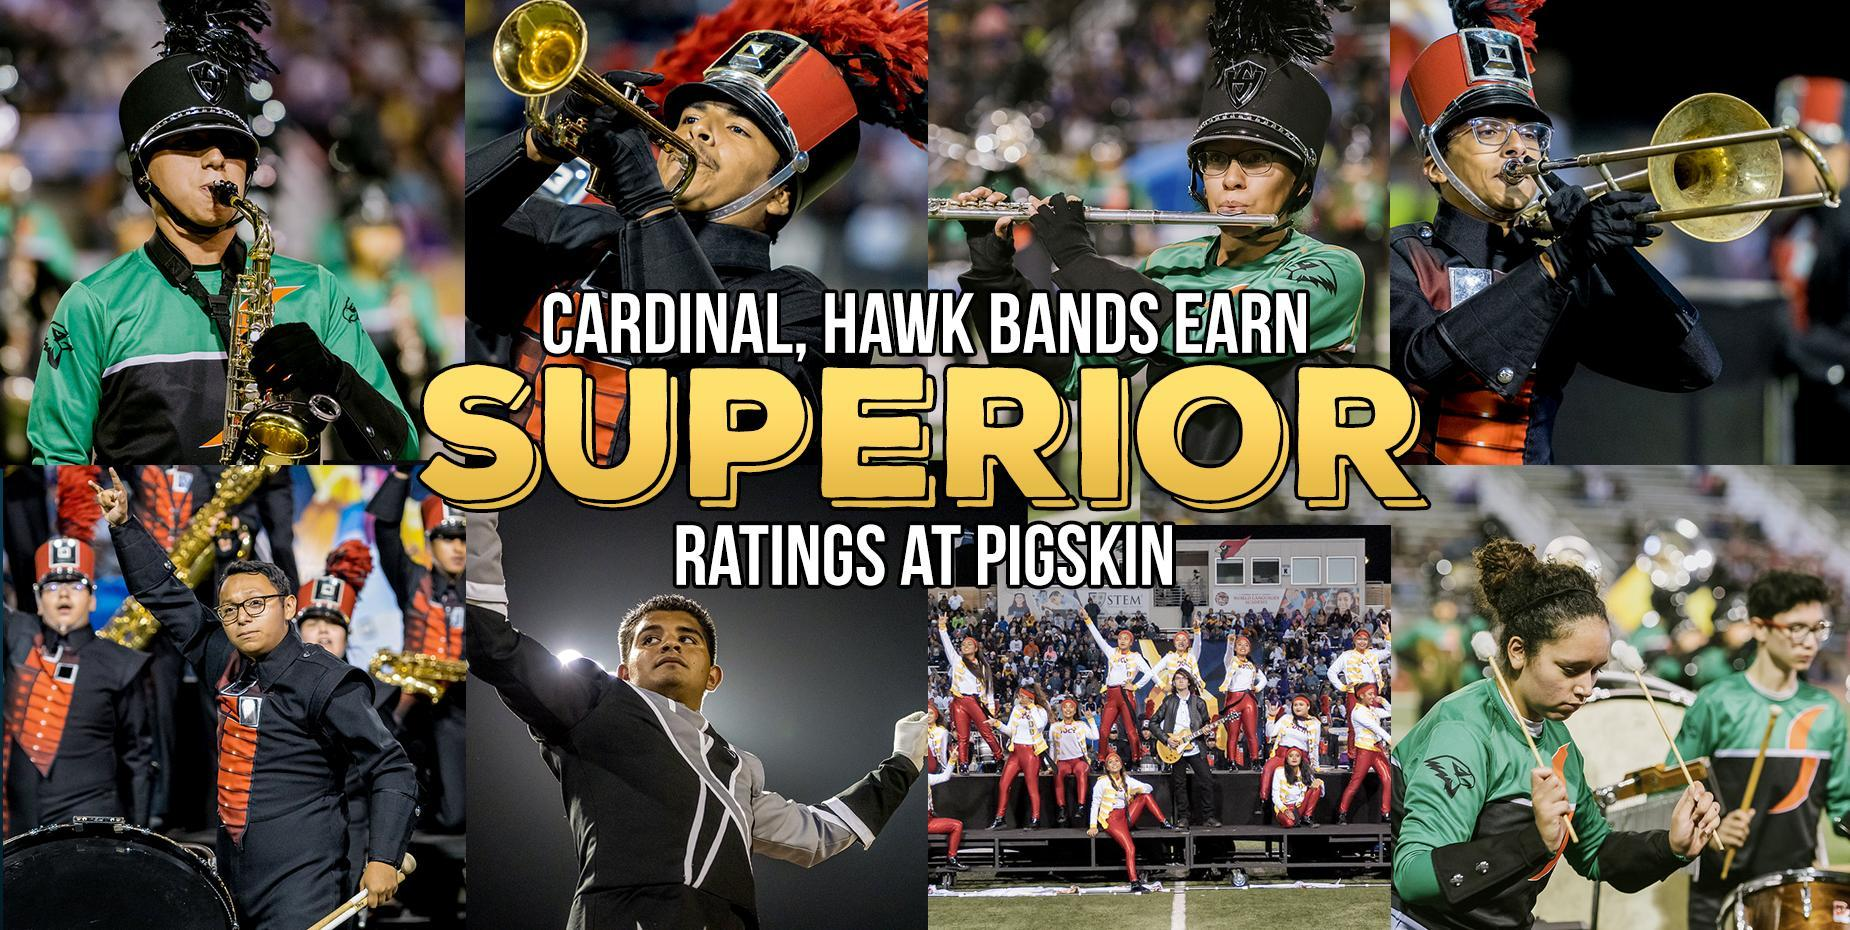 Cardinal, Hawk bands earn superior ratings at Pigskin